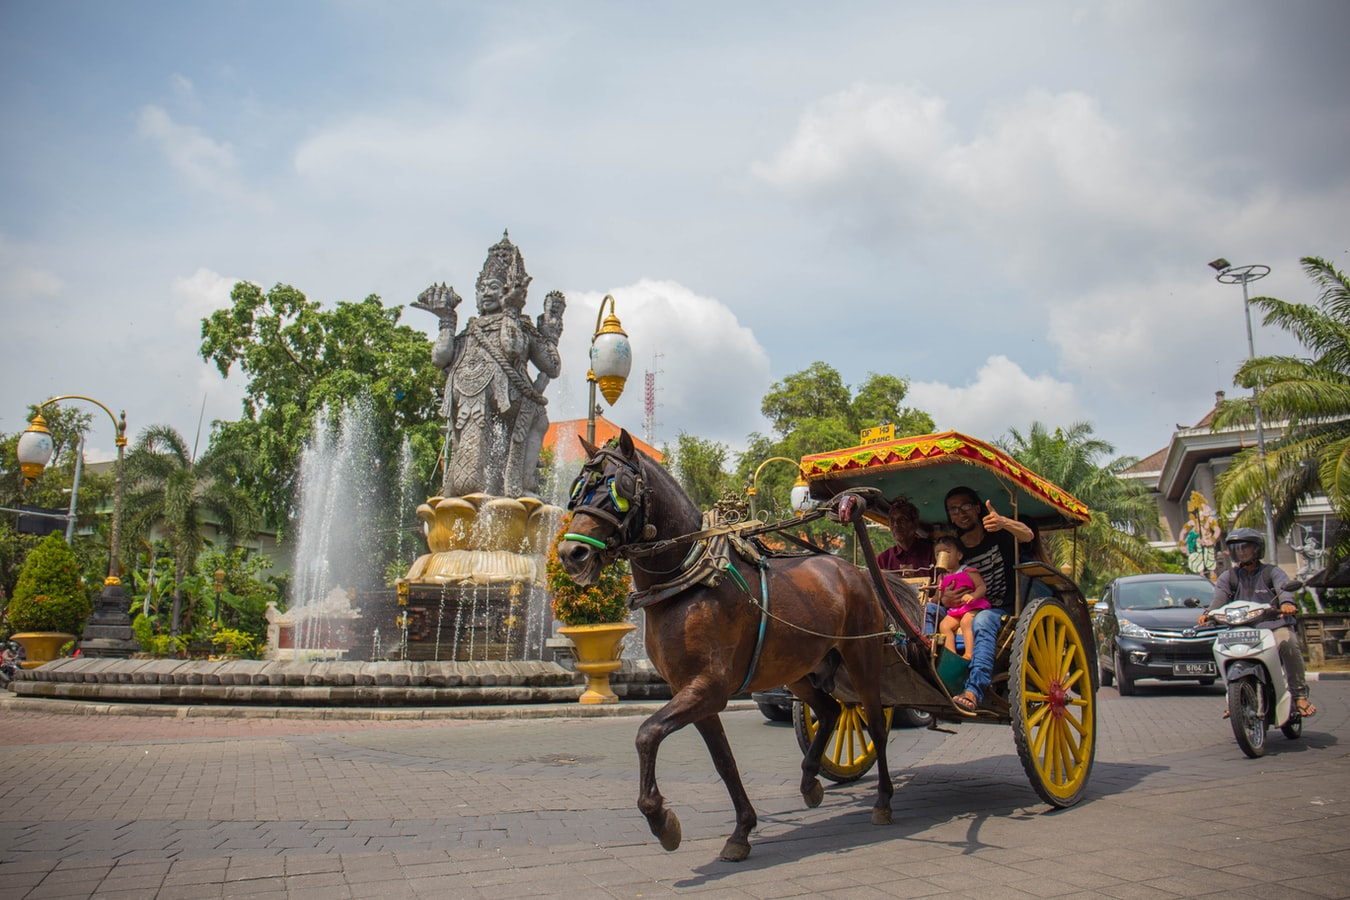 Pferdekutsche in Denpasar Bali